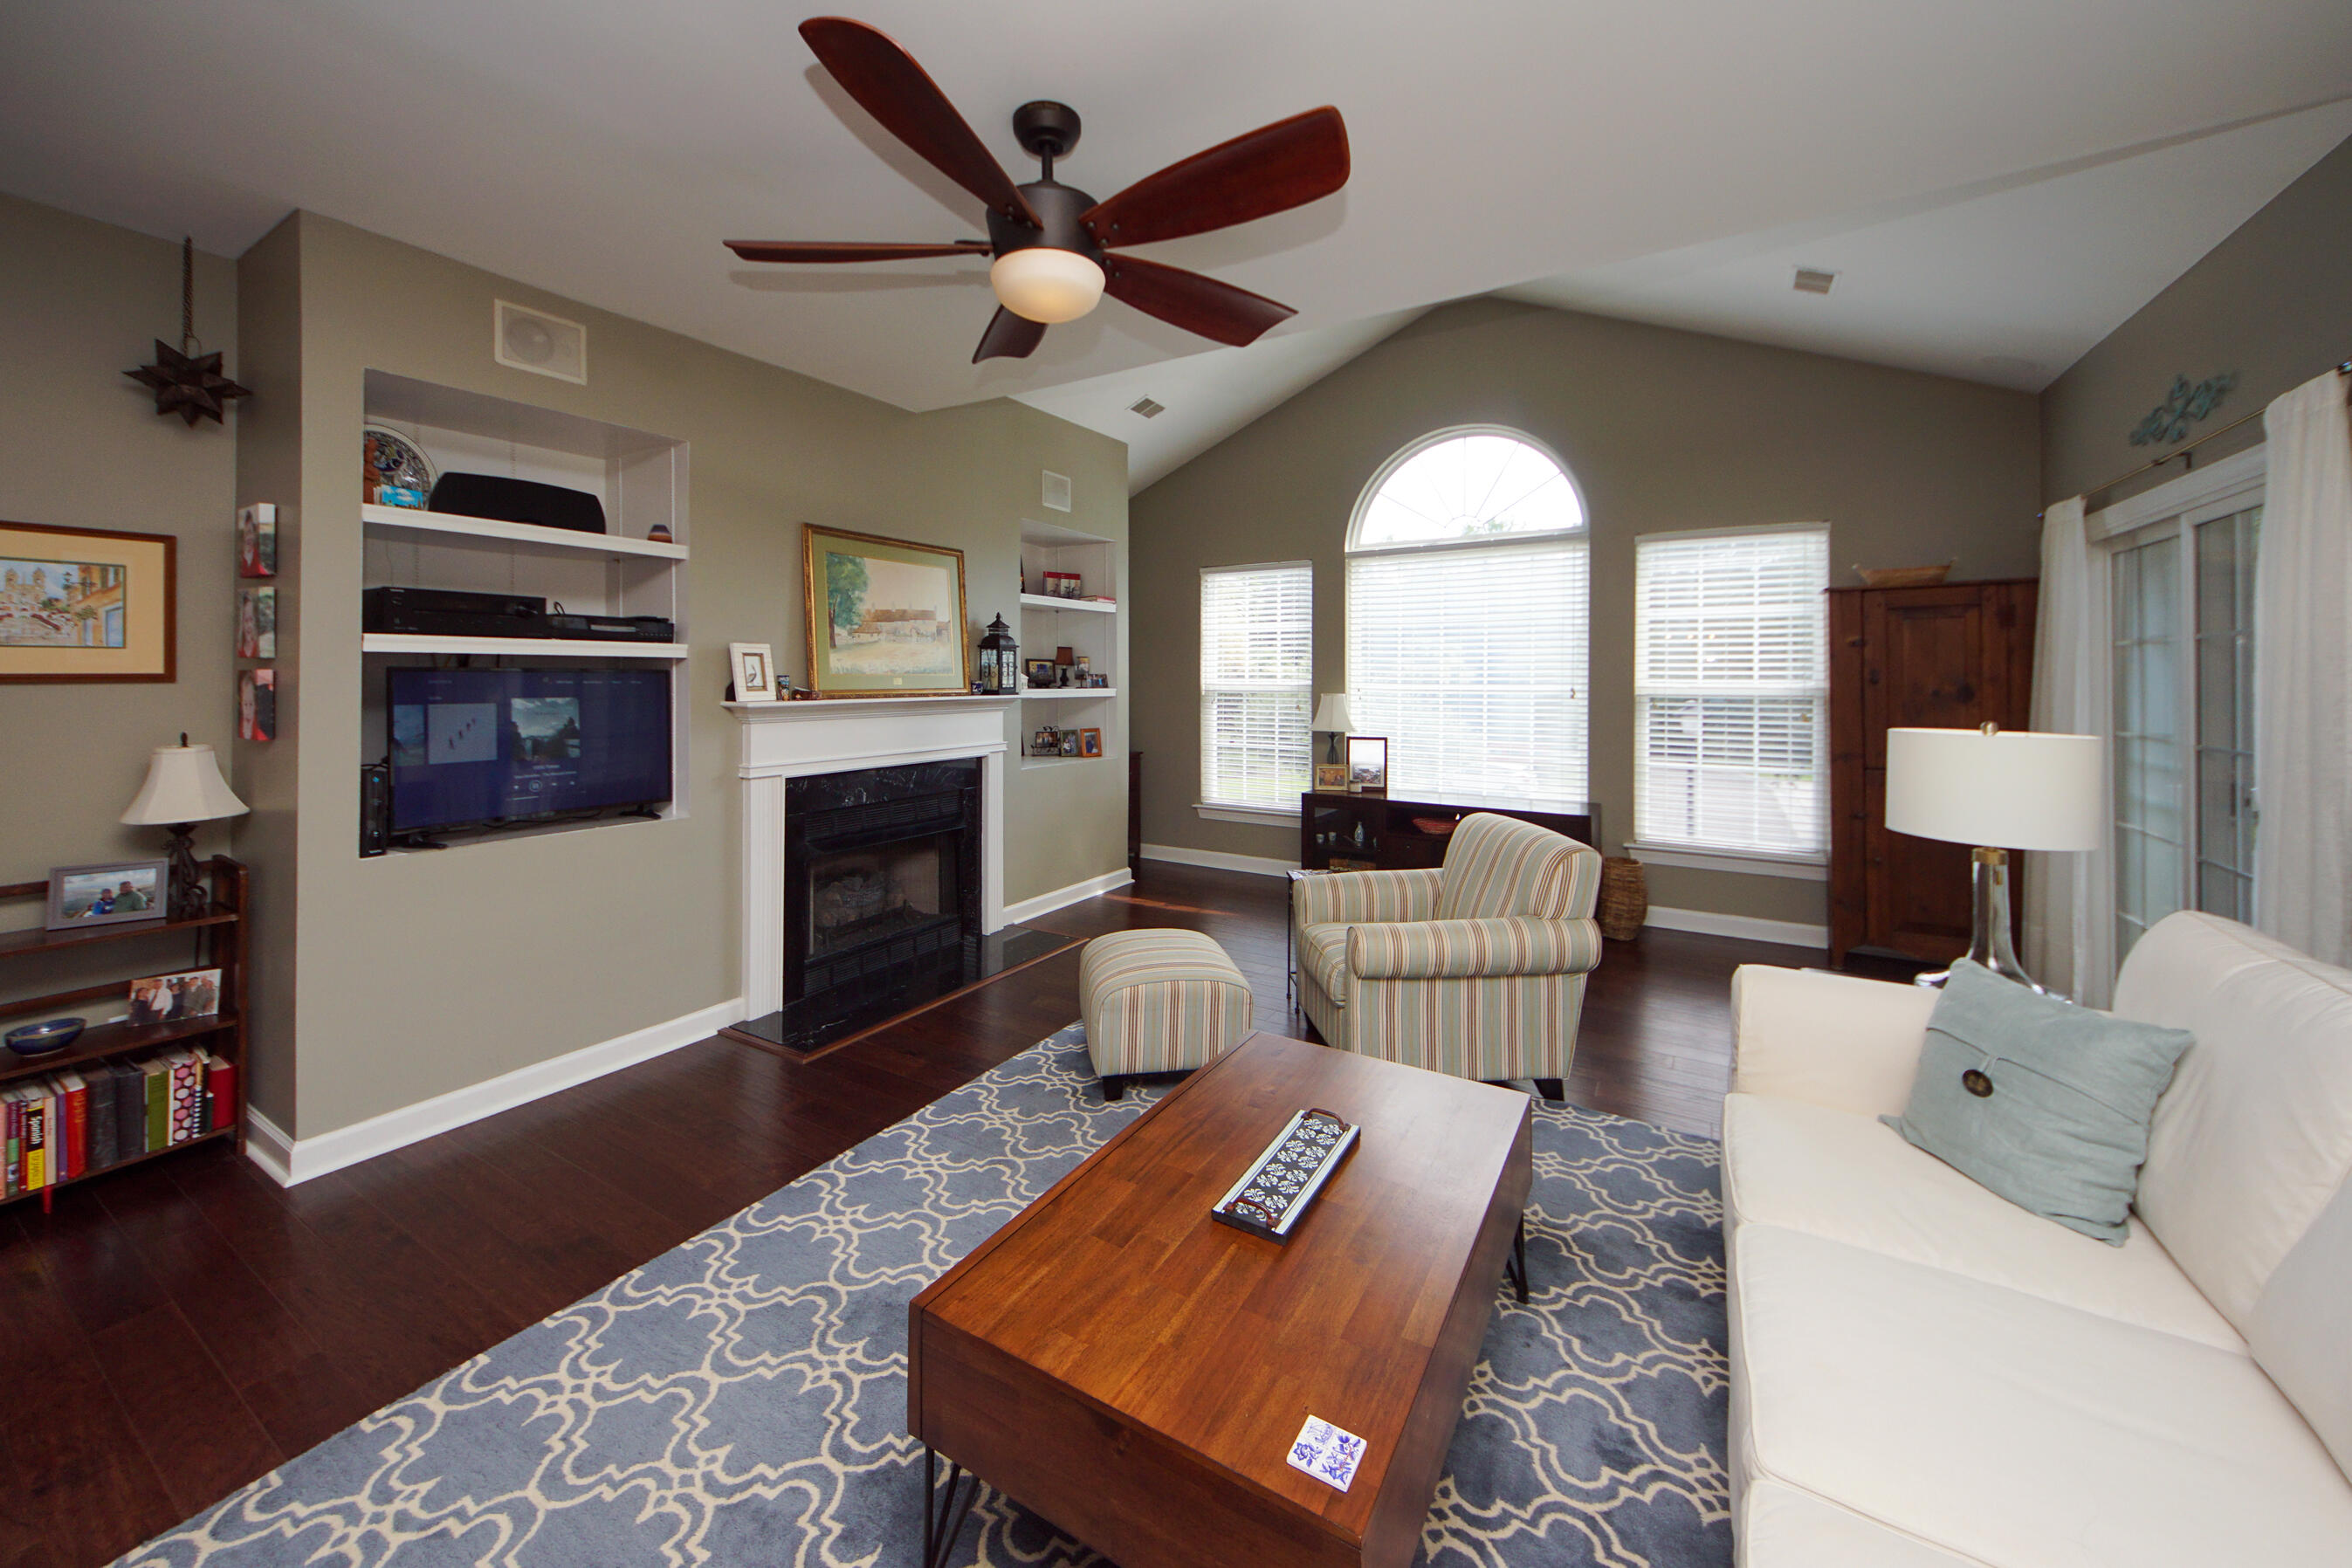 Dunes West Homes For Sale - 1631 Camfield, Mount Pleasant, SC - 12